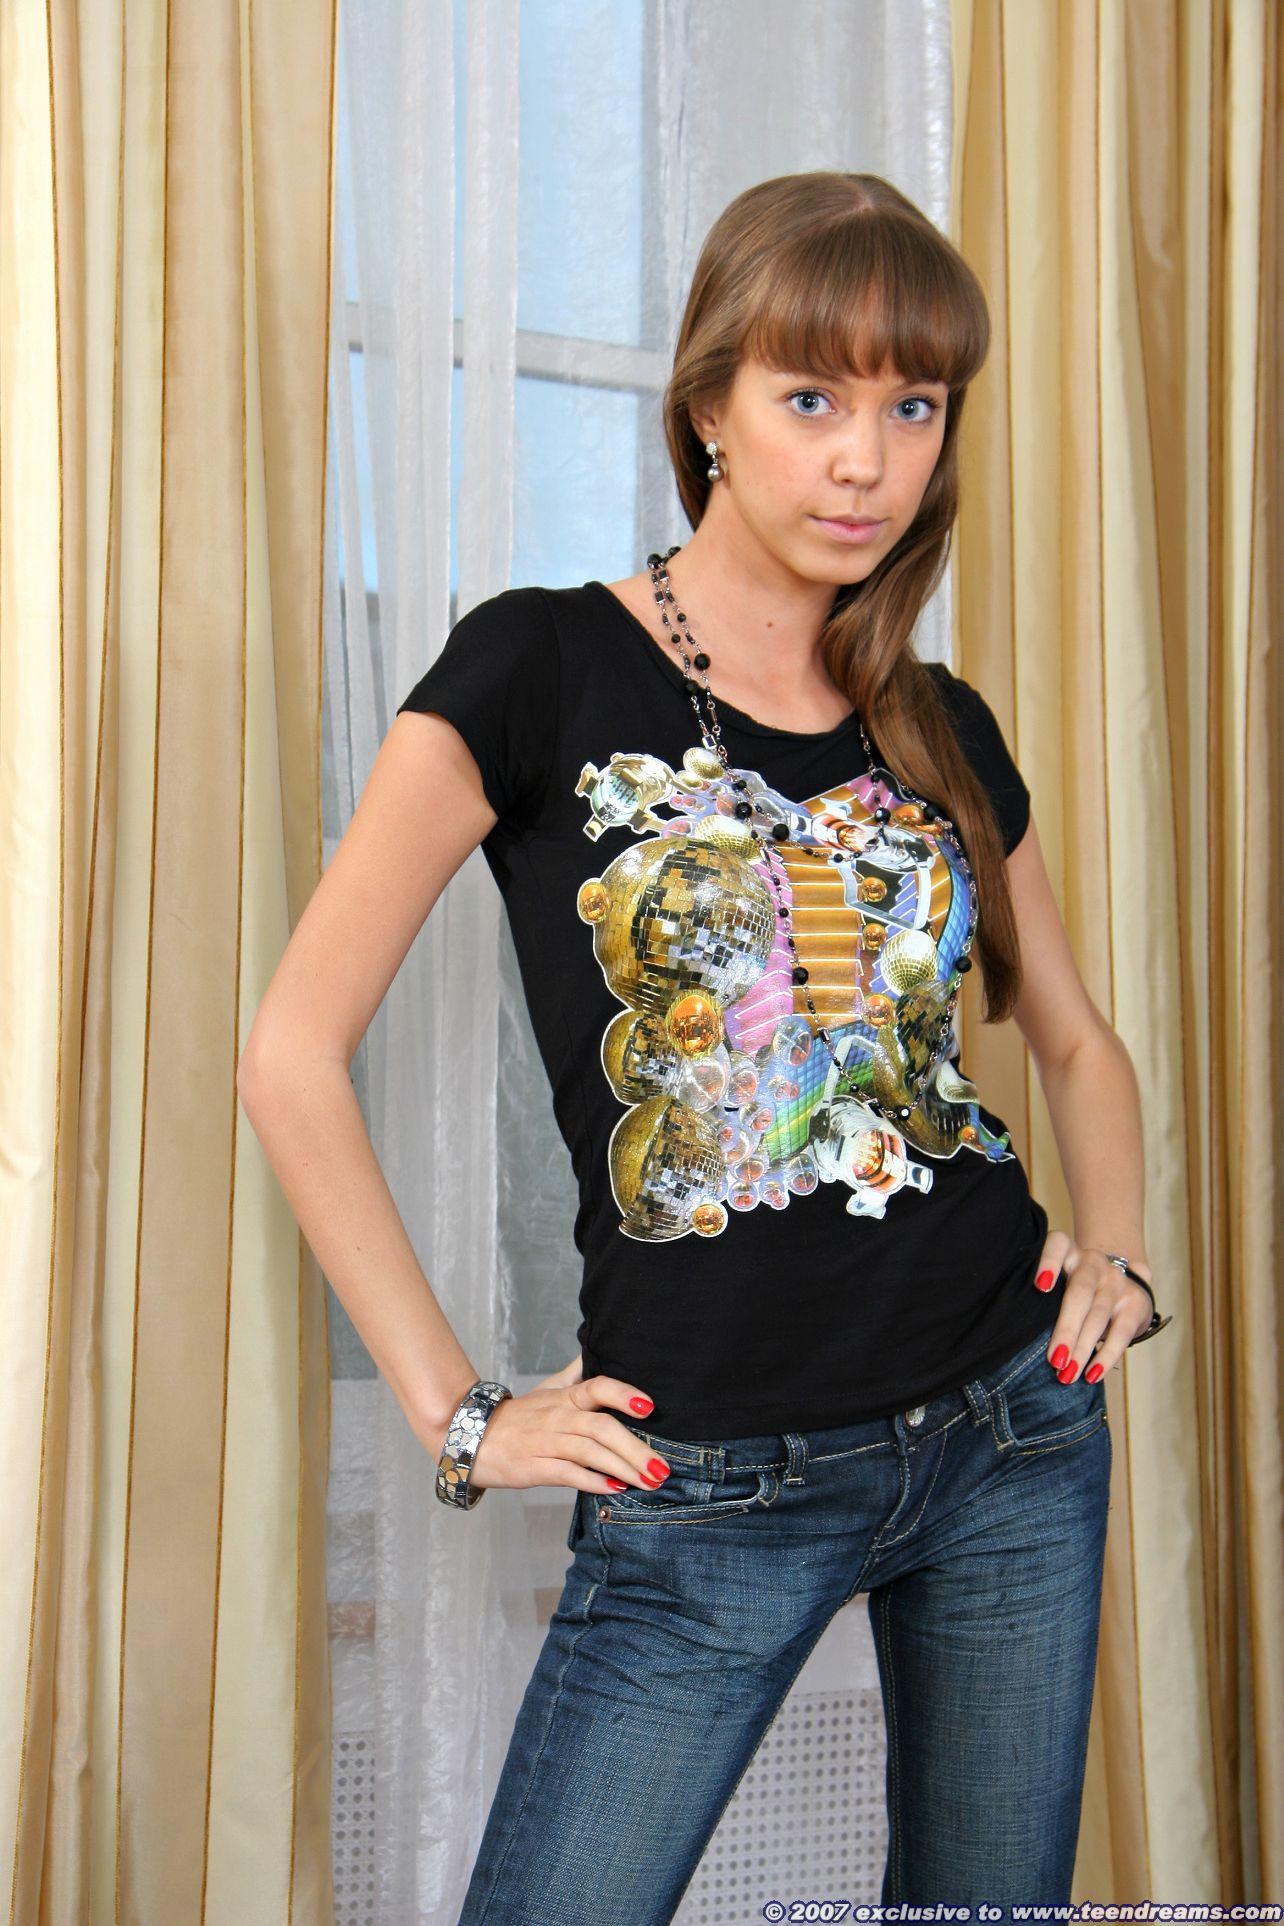 Ukrainian legal age teenager looking super hot » ukrainian